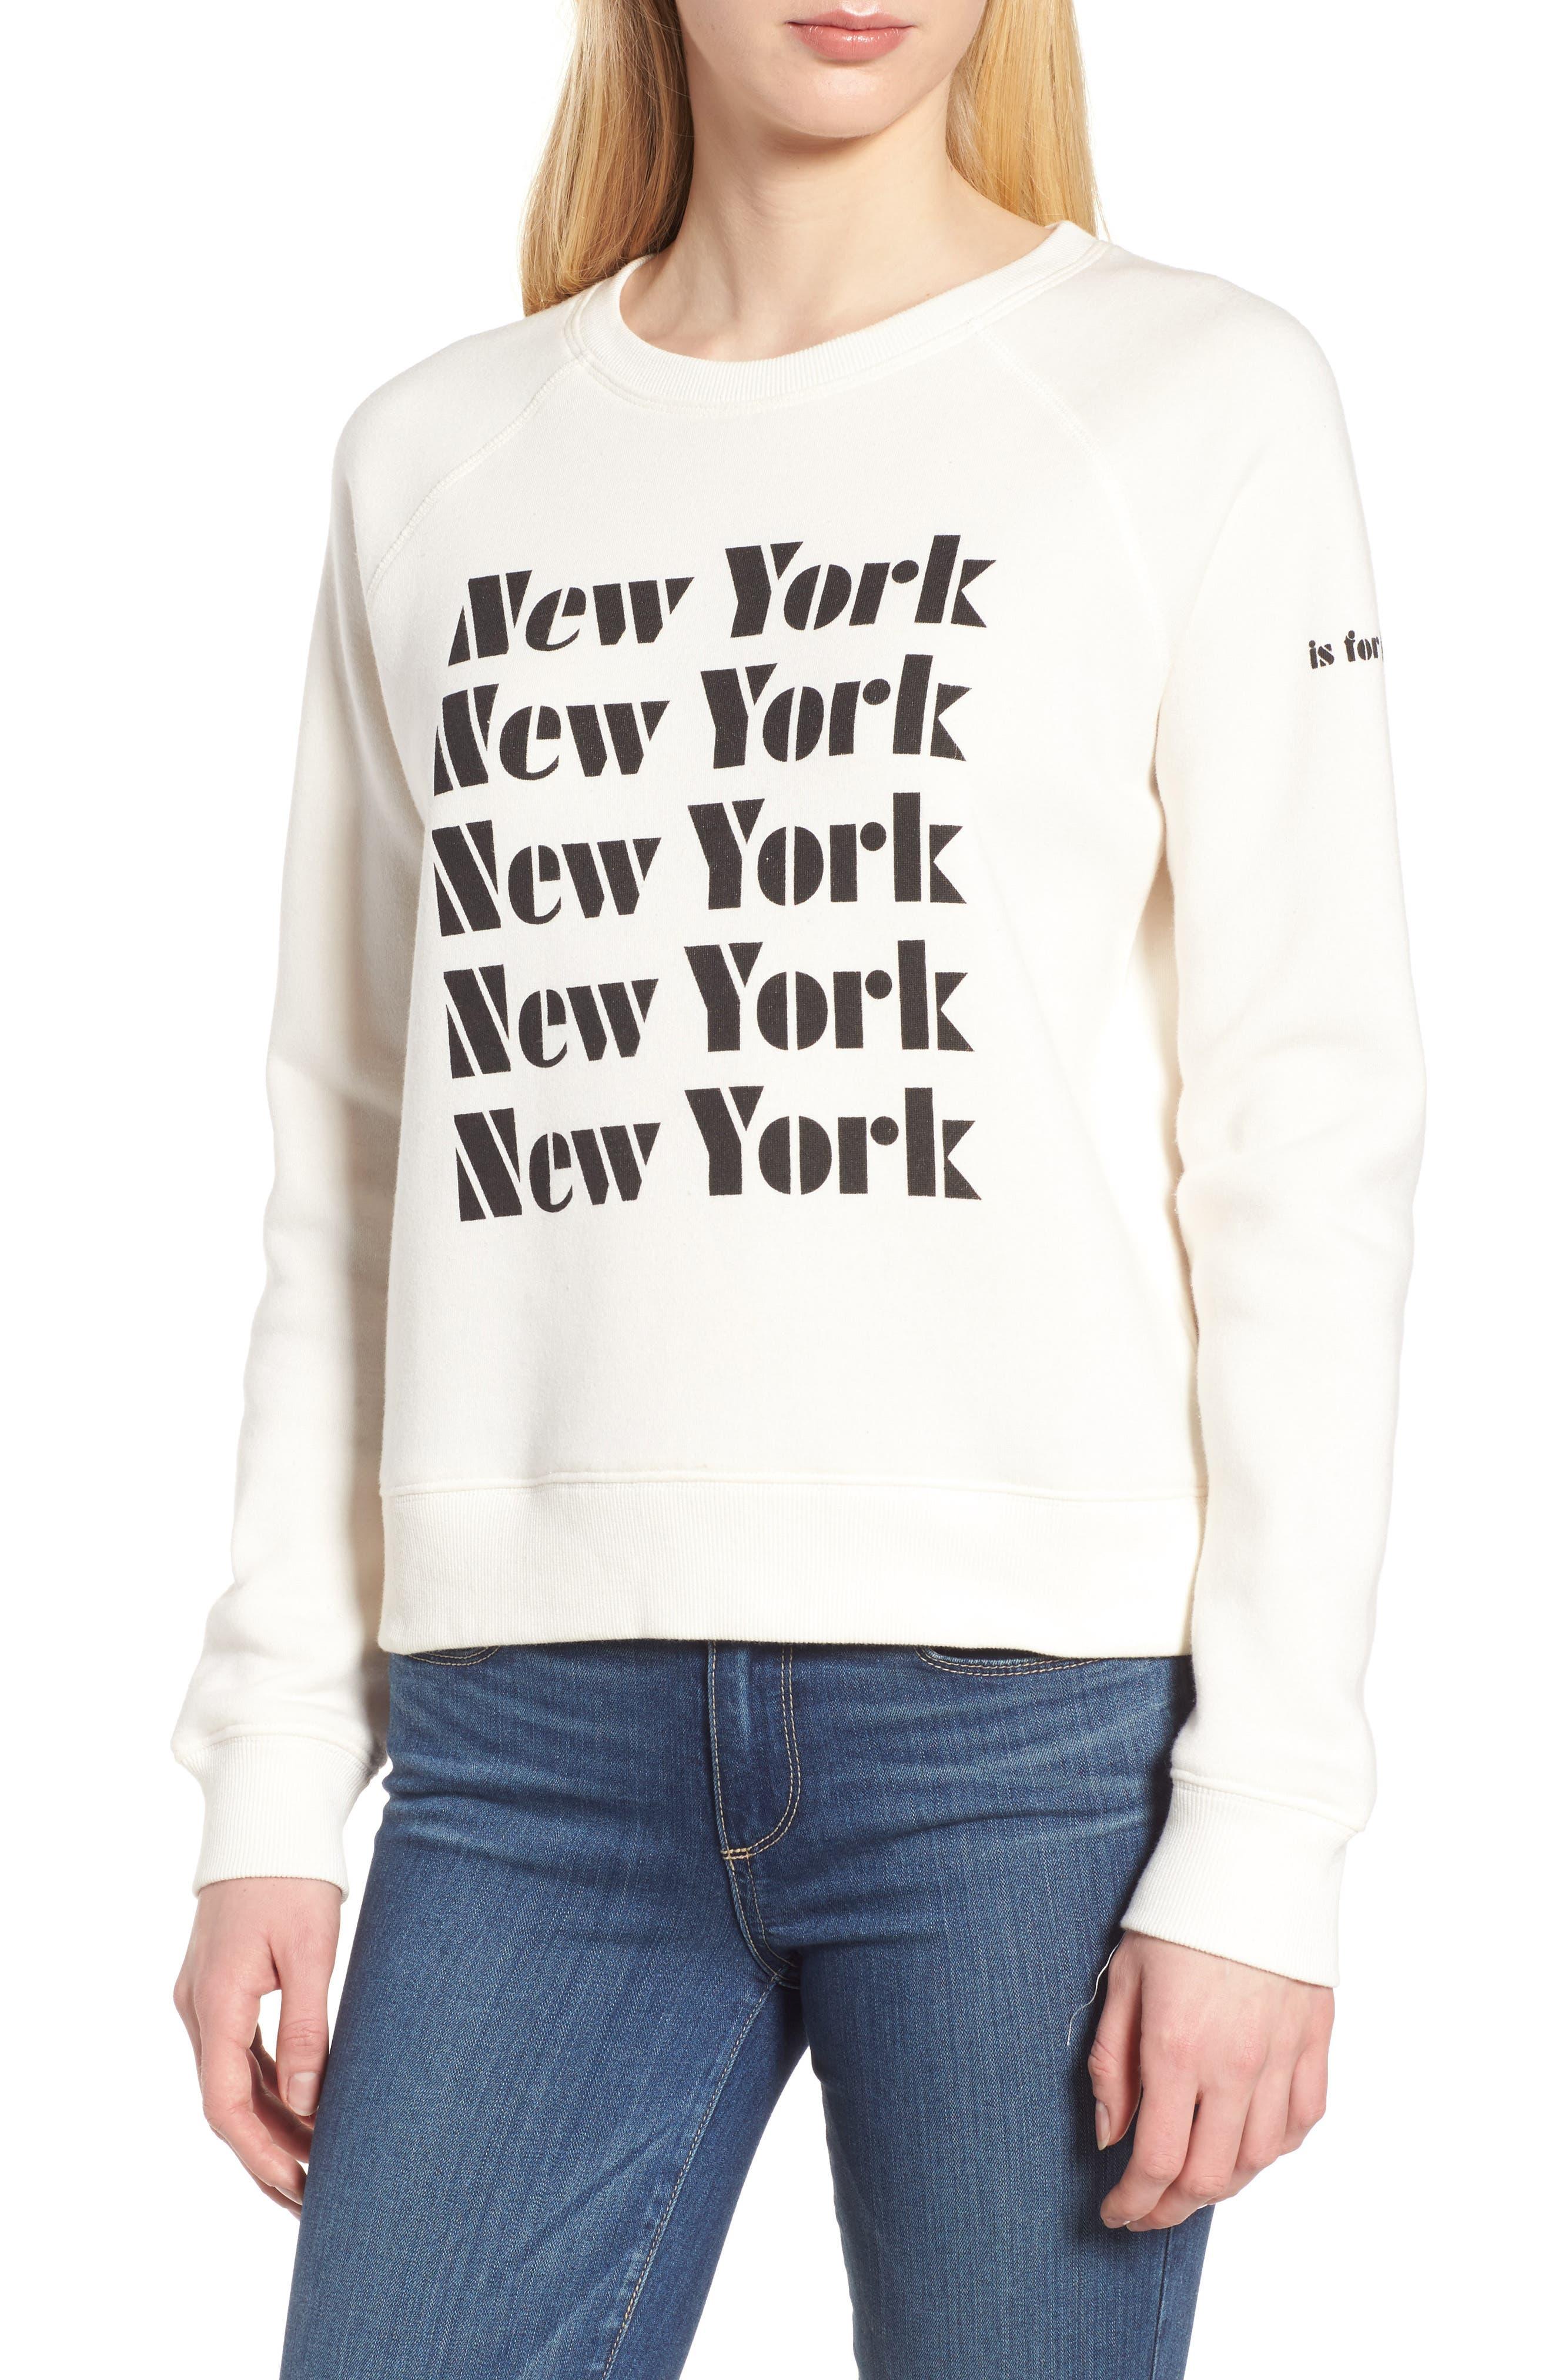 Rebecca Minkoff New York Sweatshirt